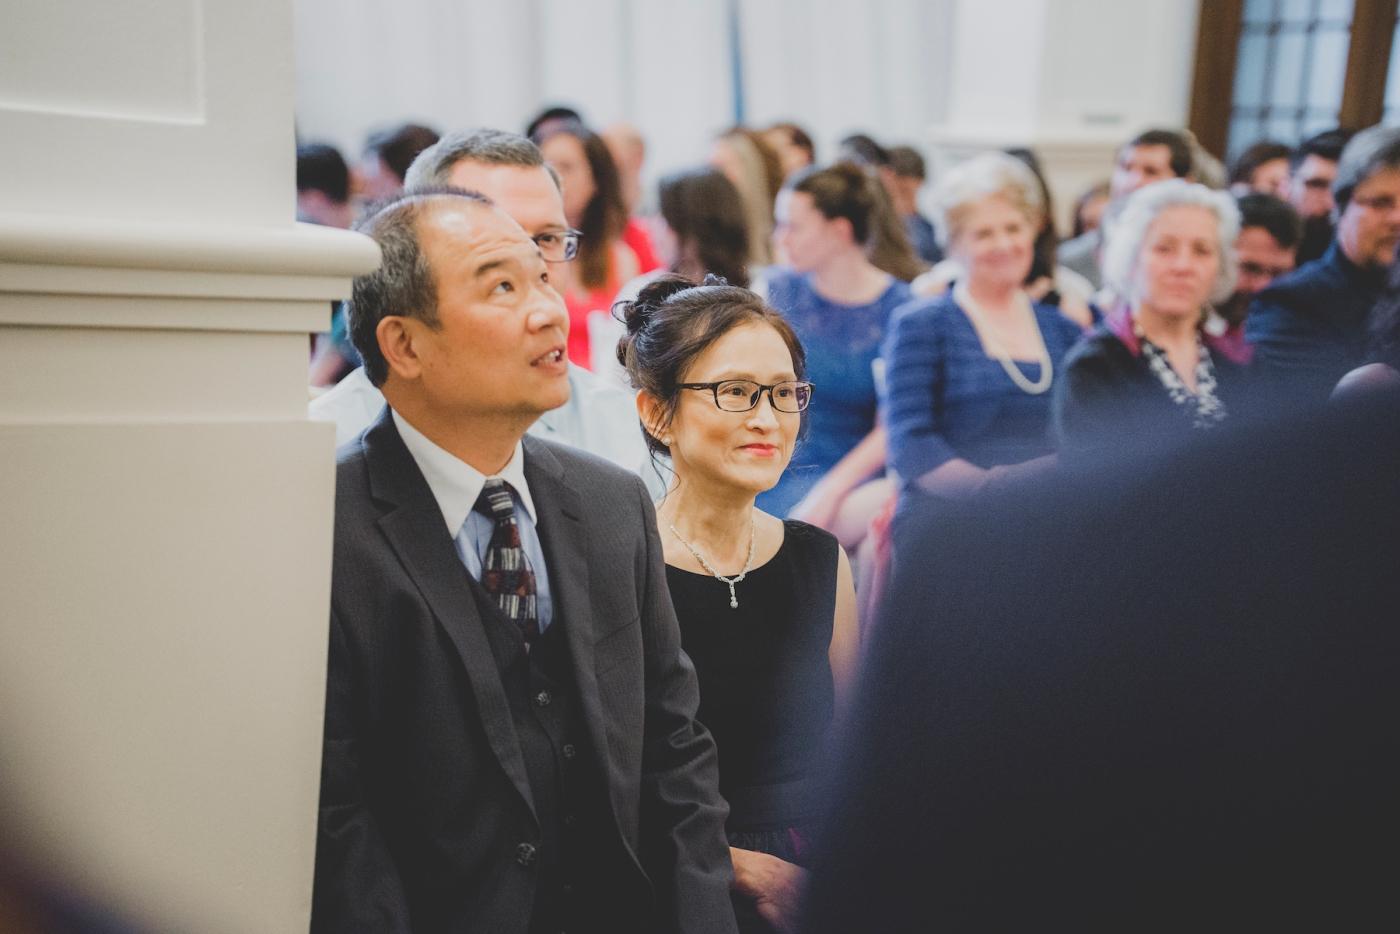 DSC_2524Everett_Wedding_Ballroom_Jane_Speleers_photography_Rachel_and_Edmund_Ceremony_2017